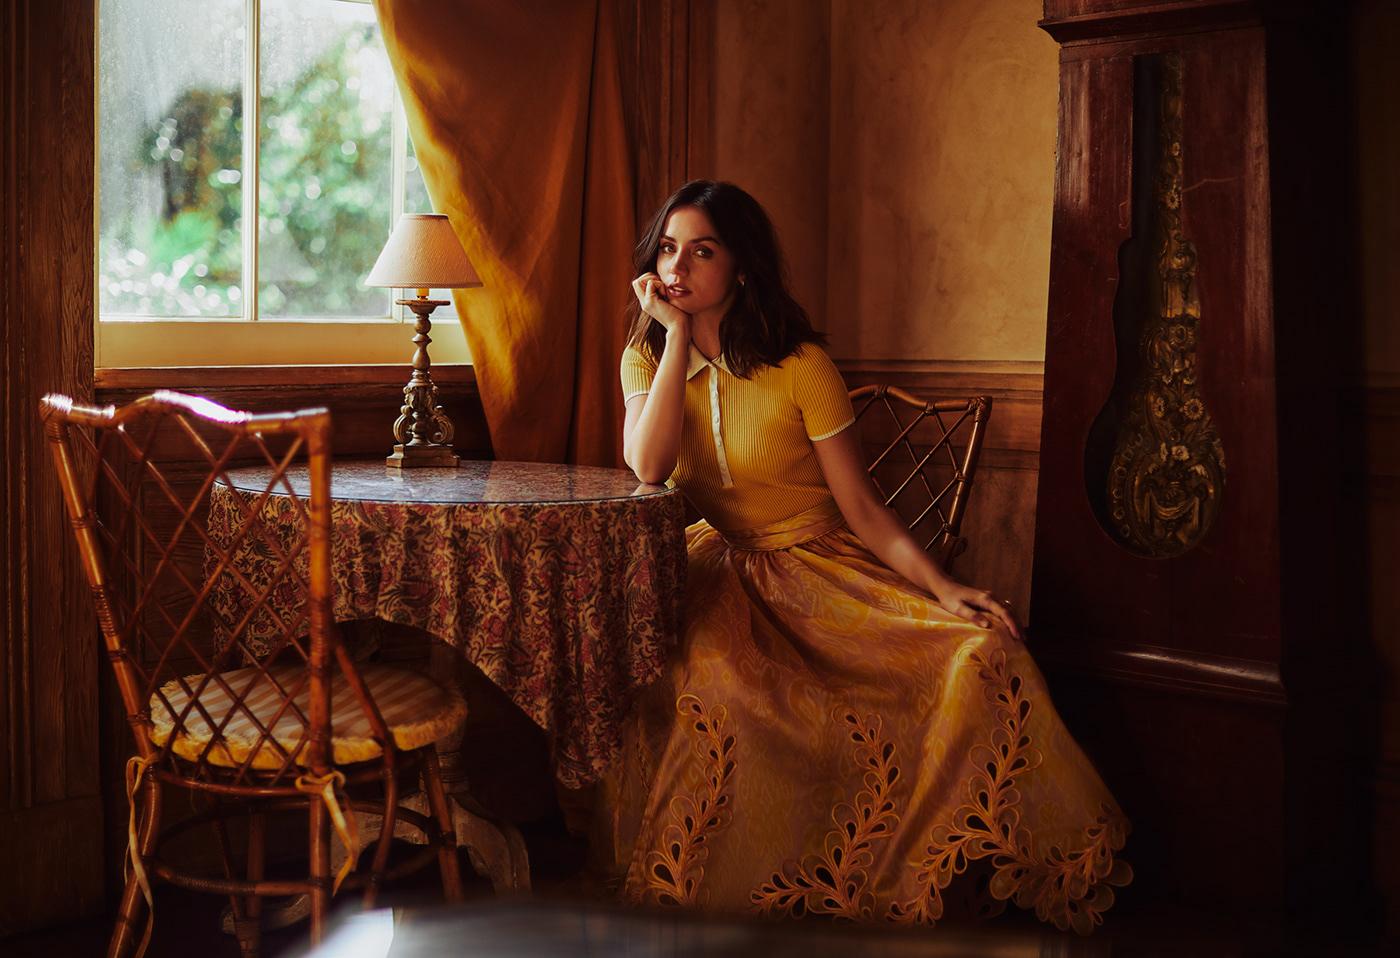 celebrity photography fashion photography Photography  photoshop retouch retoucher retouching